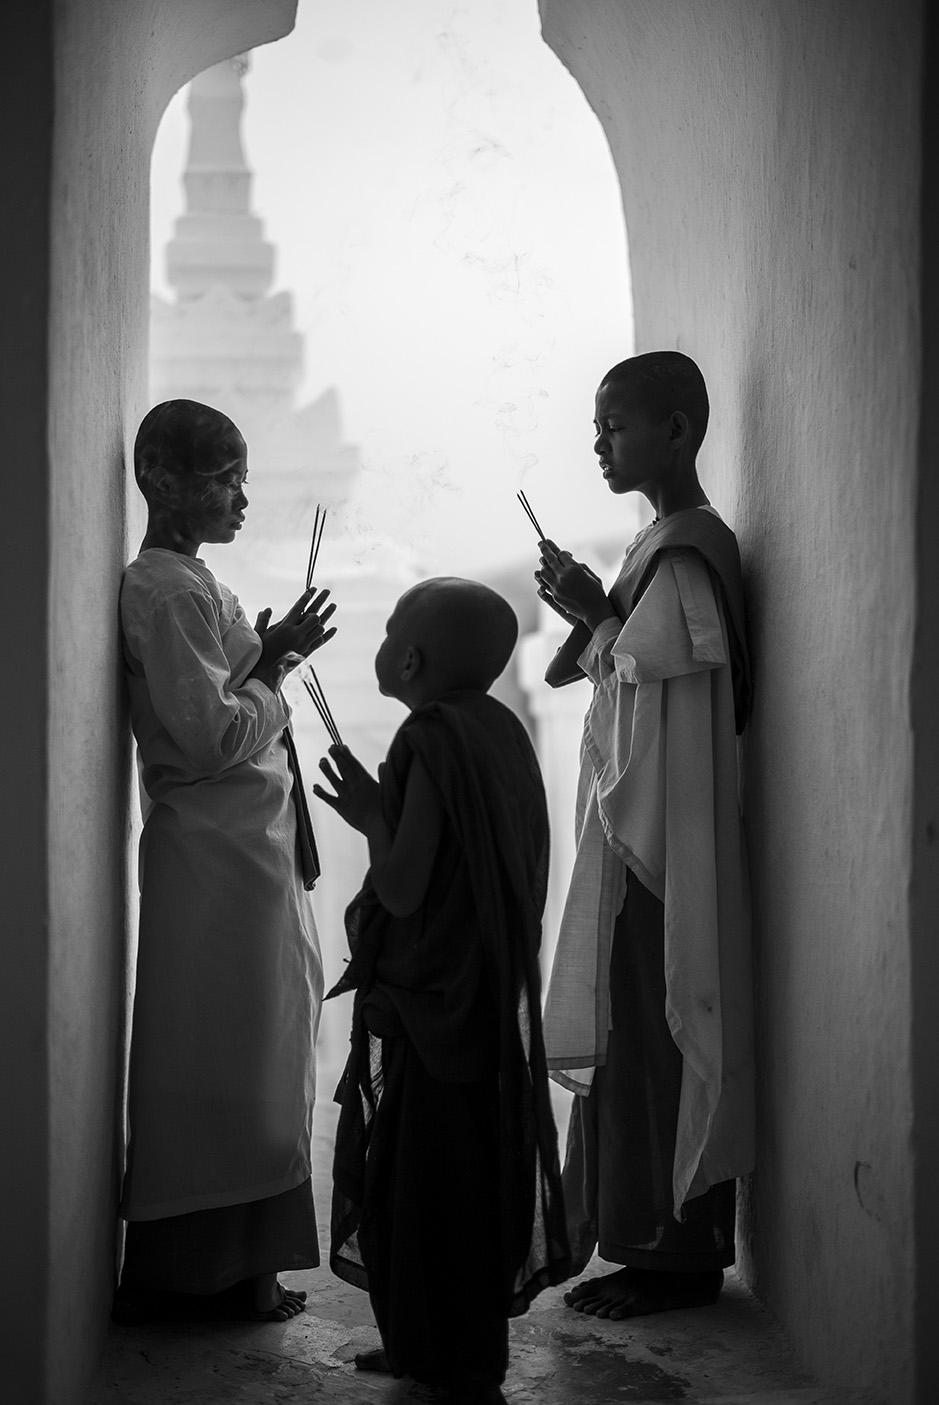 eileen_mccarneymuldoon_daily rituals_morning prayers_2.jpg